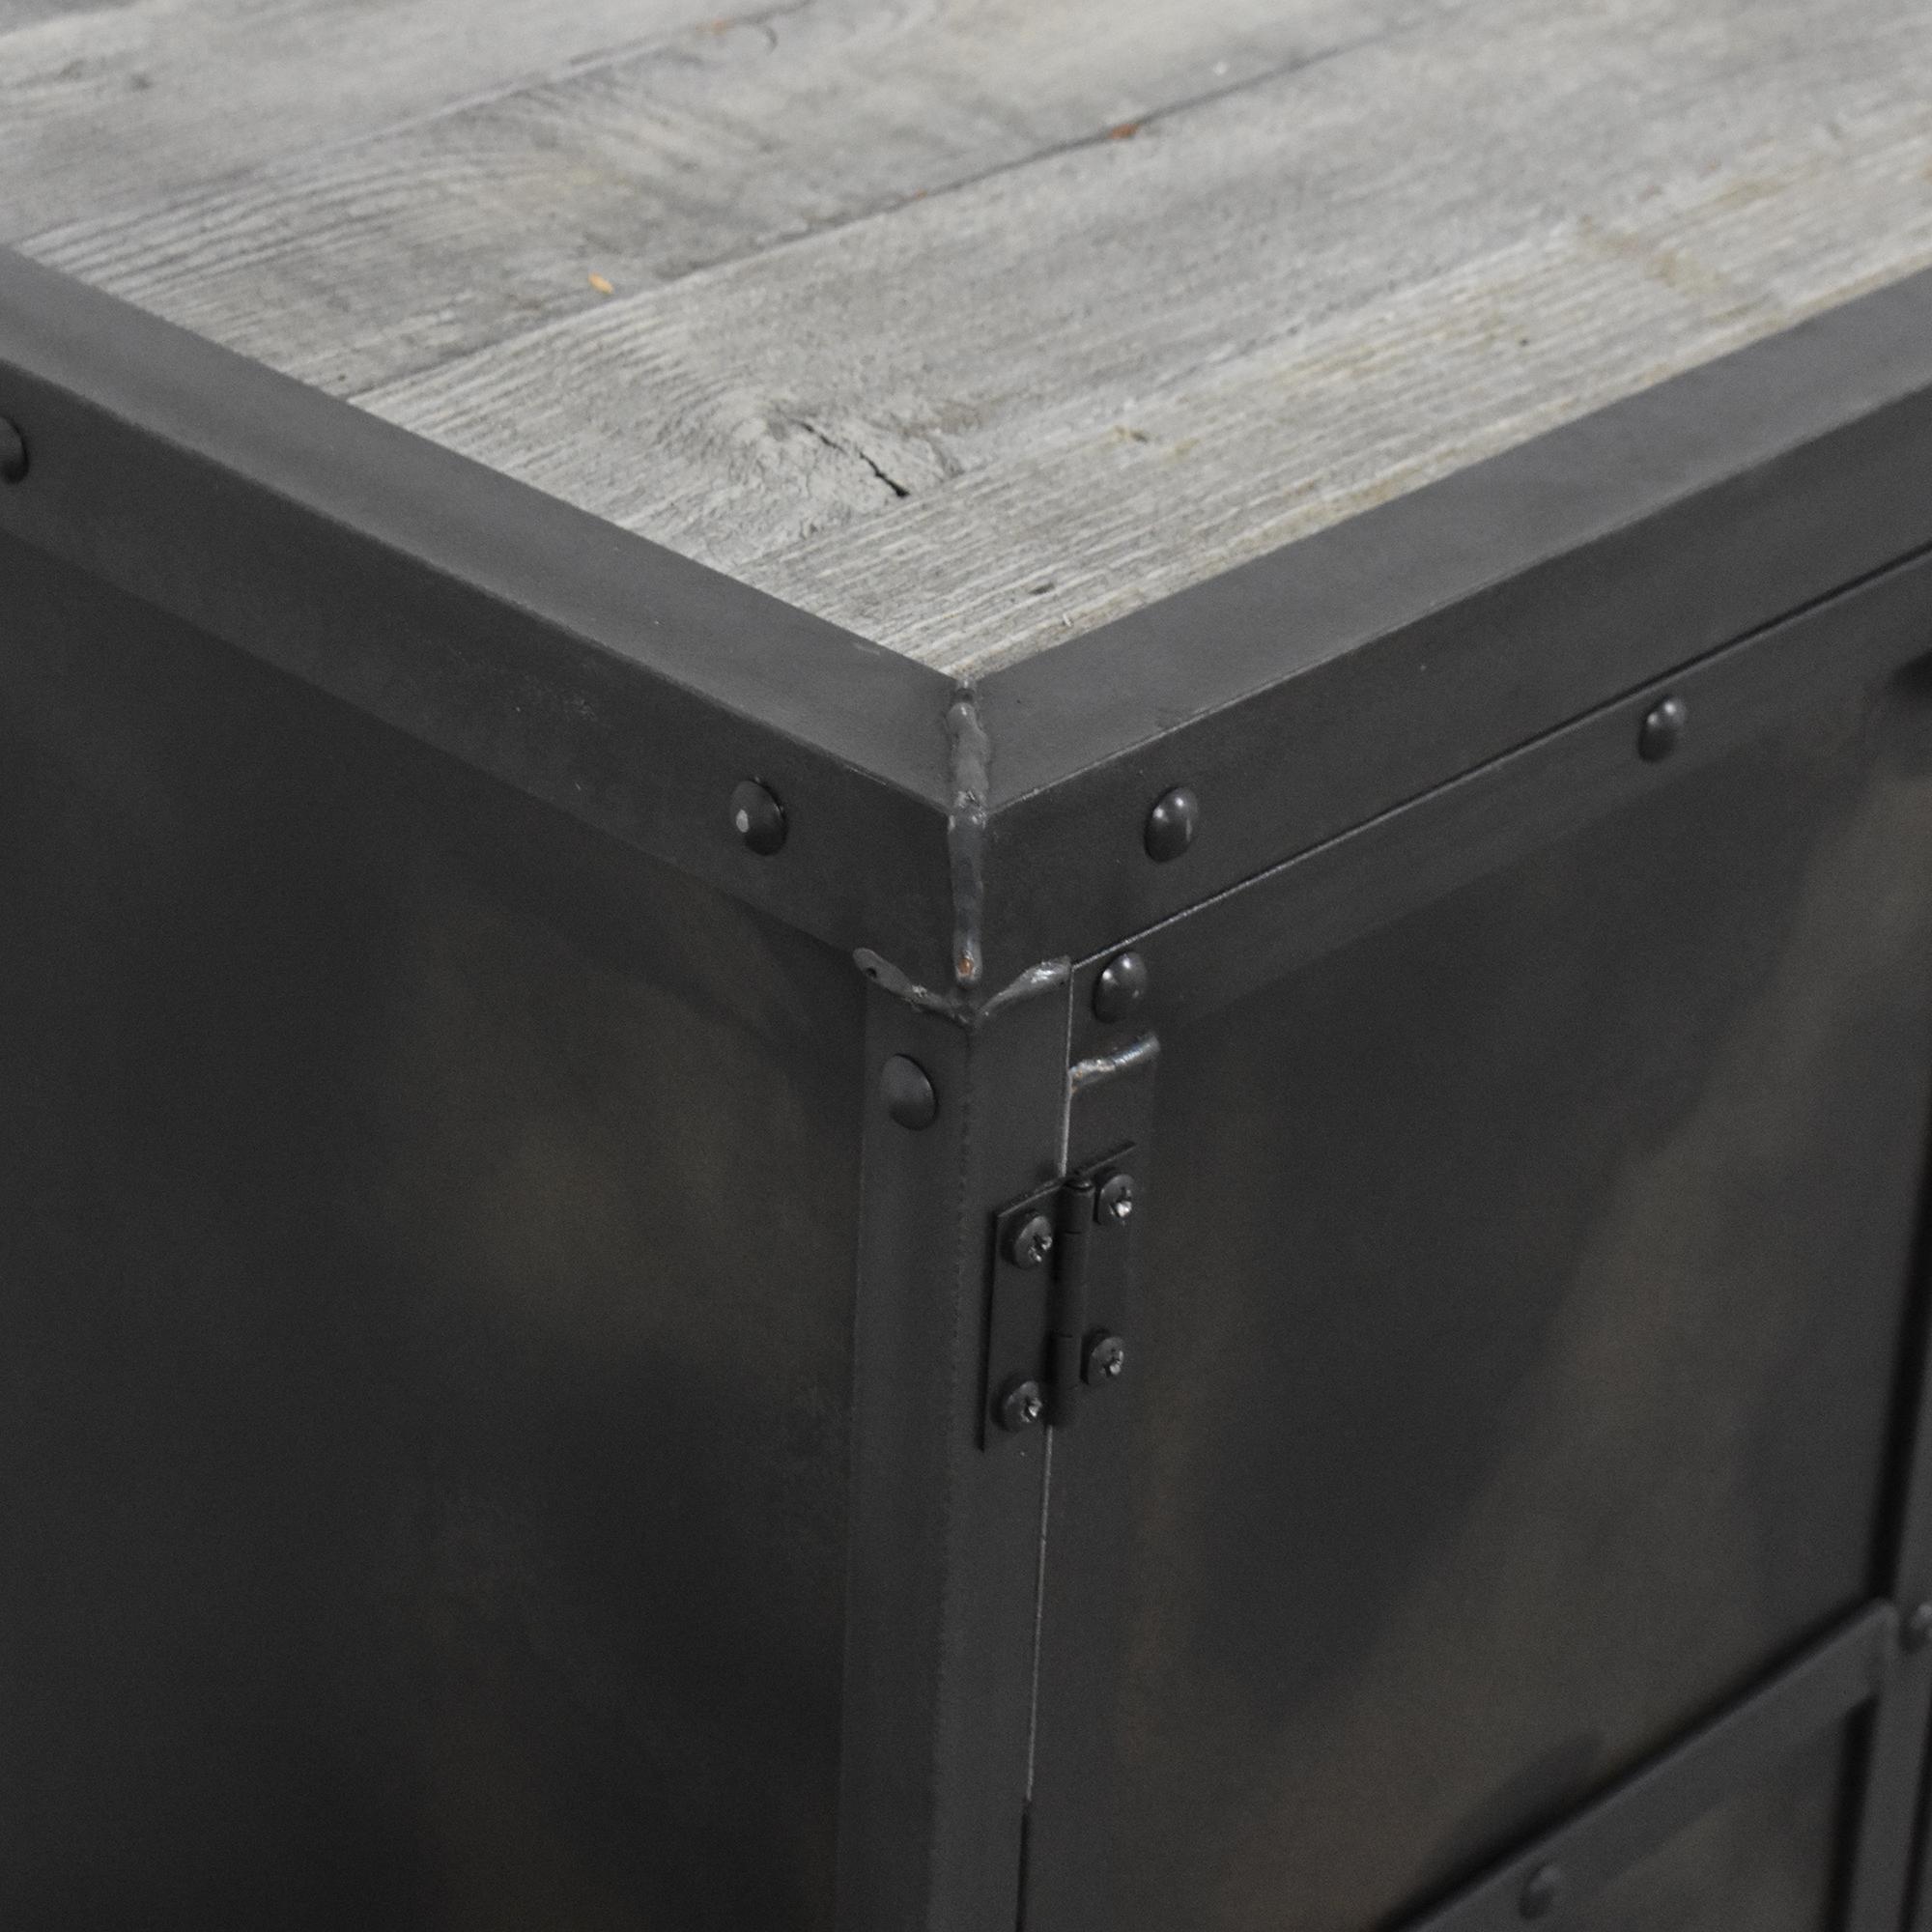 Combine 9 Combine 9 Industrial Desk with Side Cabinet Storage ct